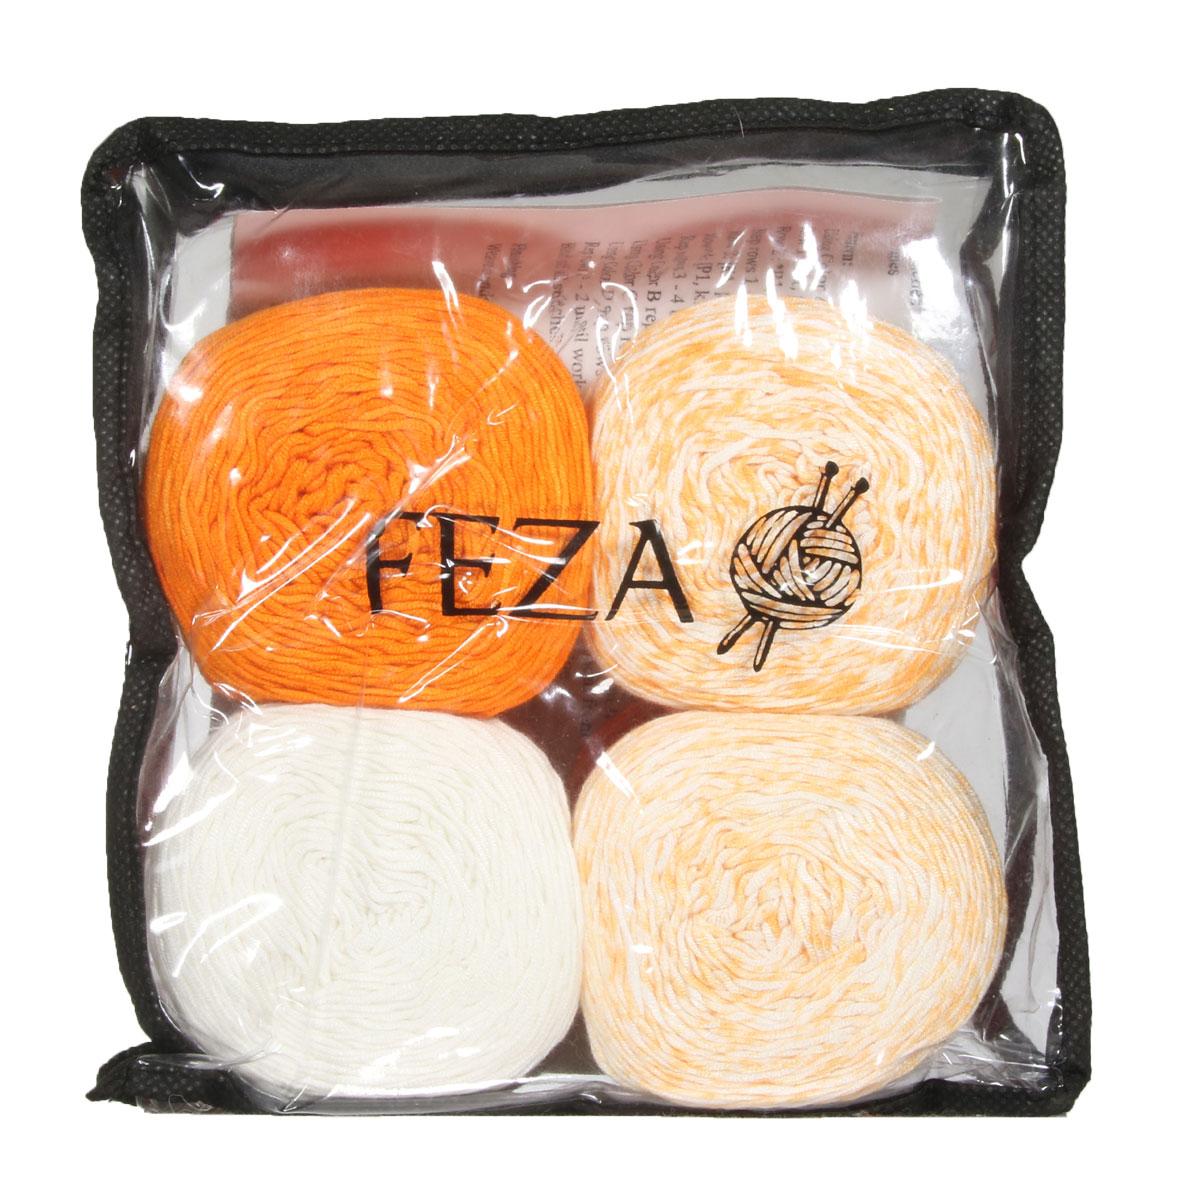 Feza Yarns Baby Gradient Yarn 507 Orange At Jimmy Beans Wool